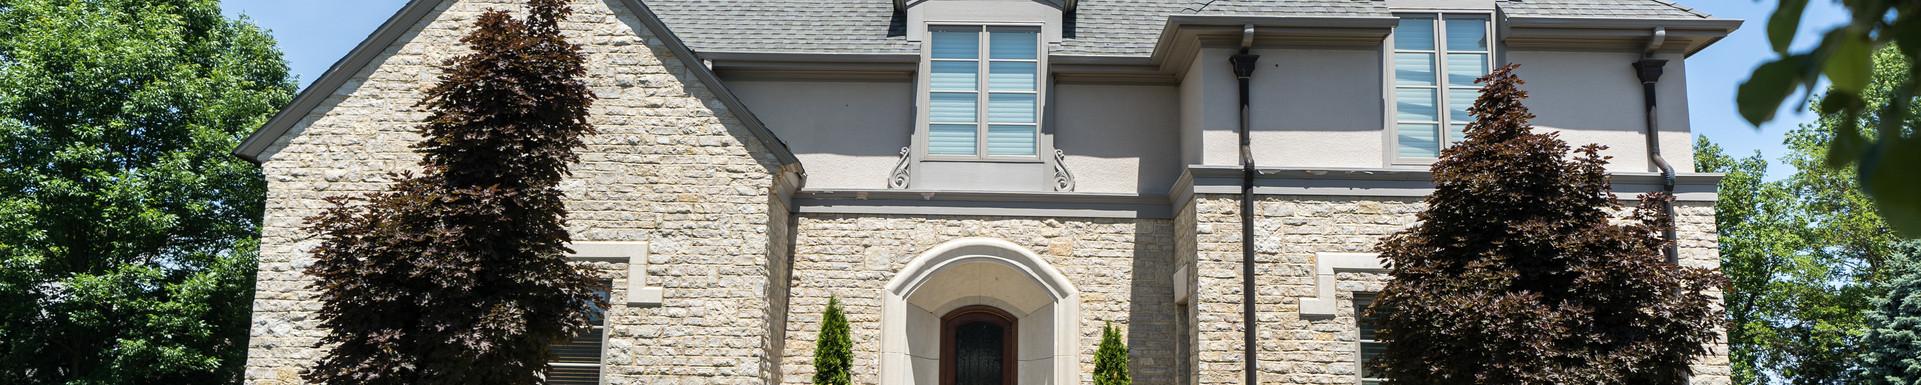 Home Design & Construction